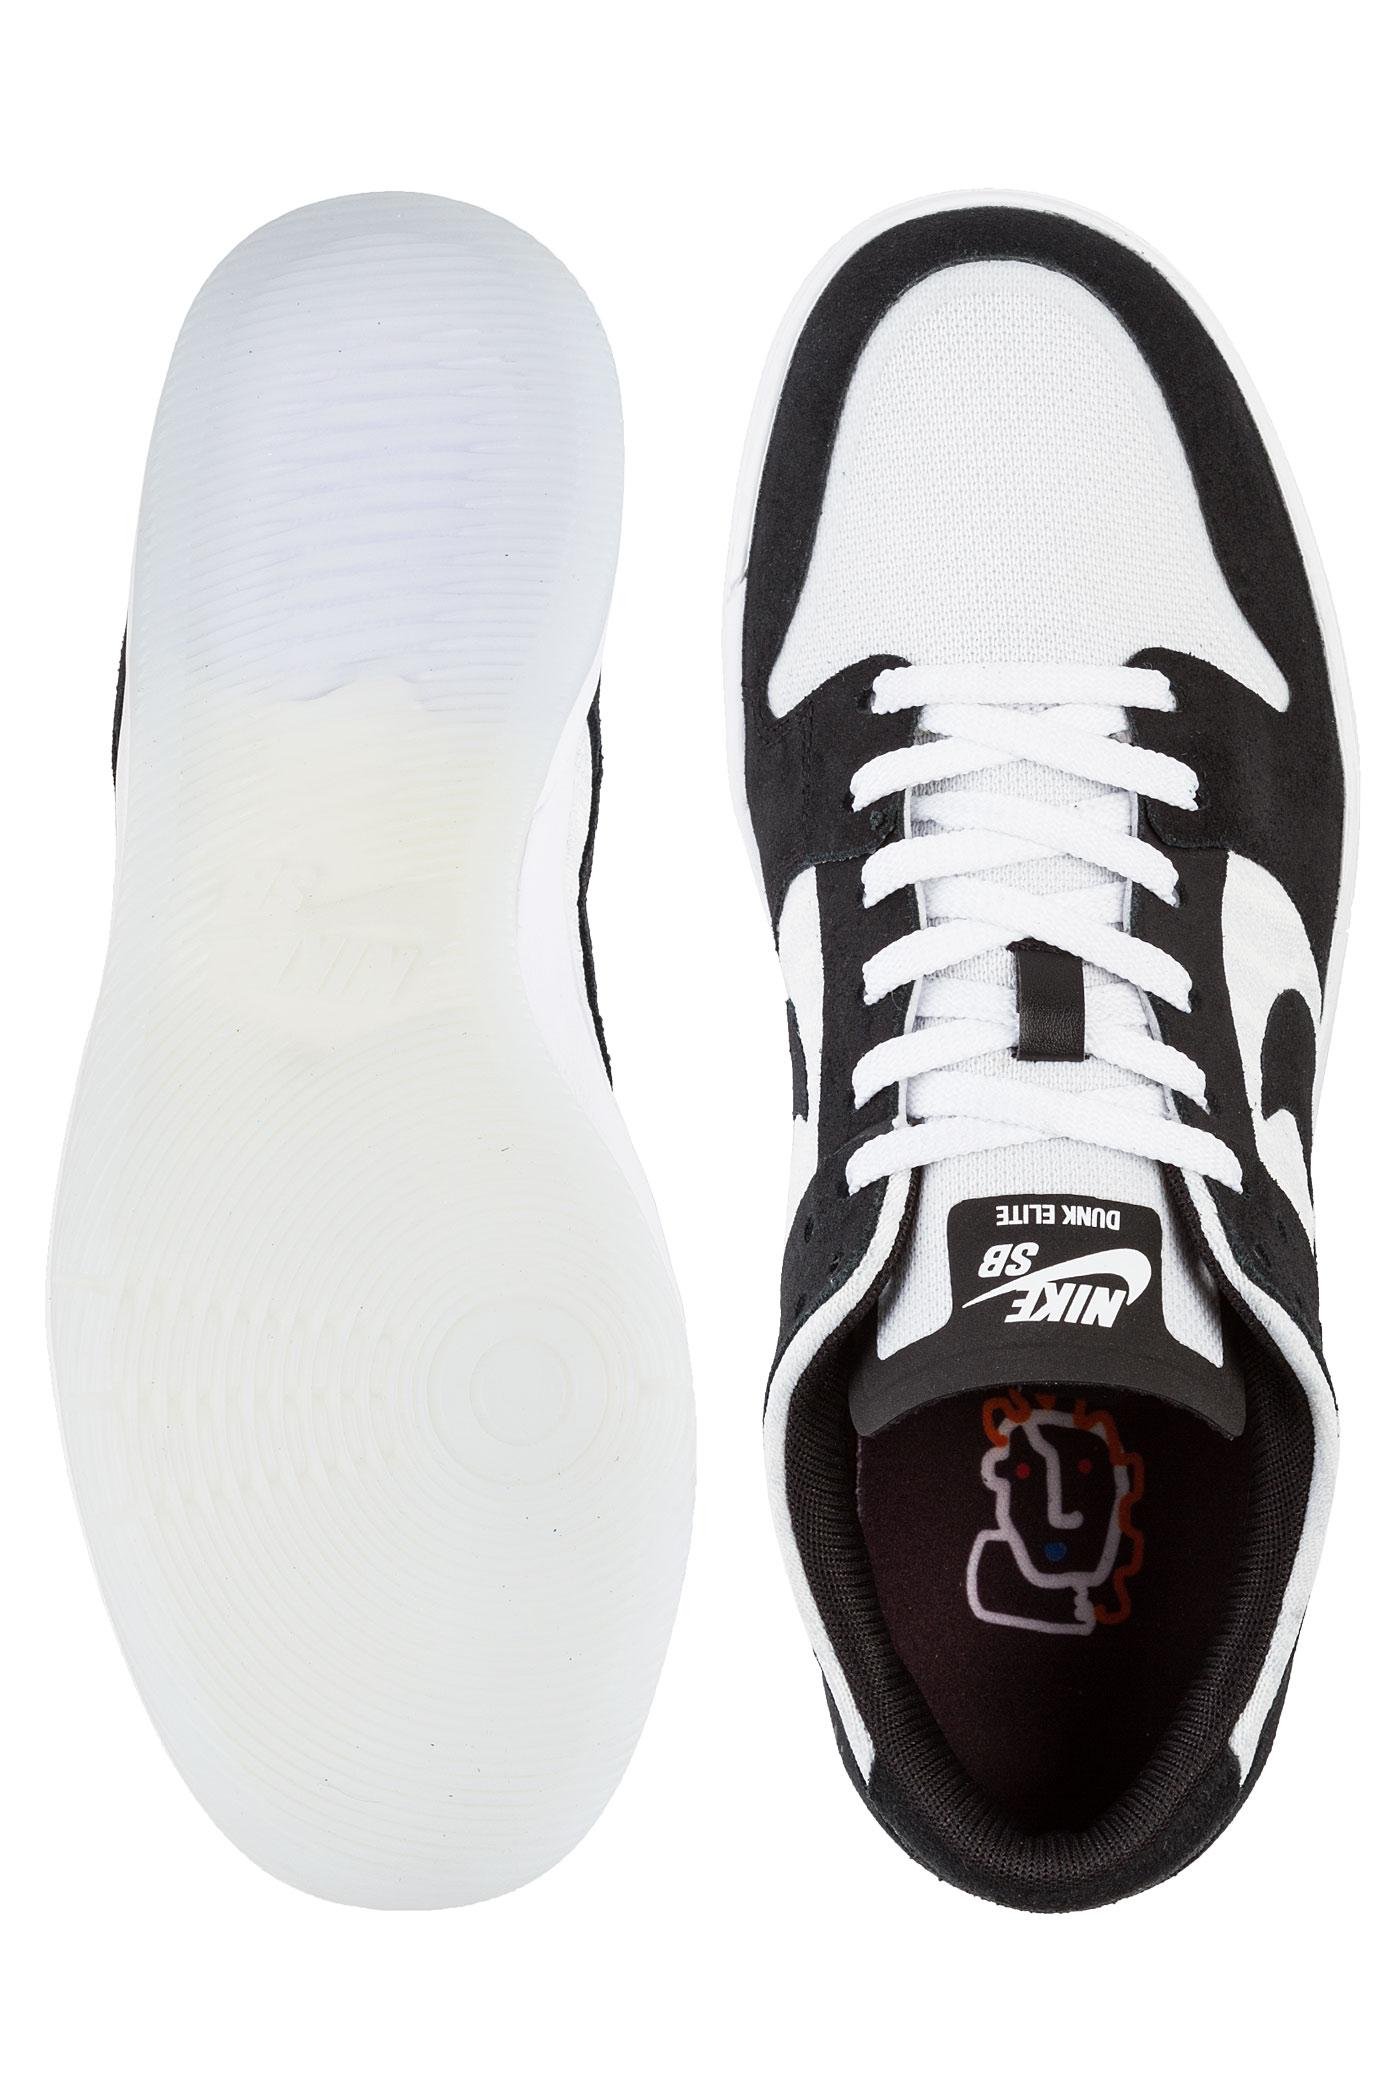 save off b5fdf 28920 ... inexpensive nike sb dunk low elite qs shoes oski black white 79254 88829